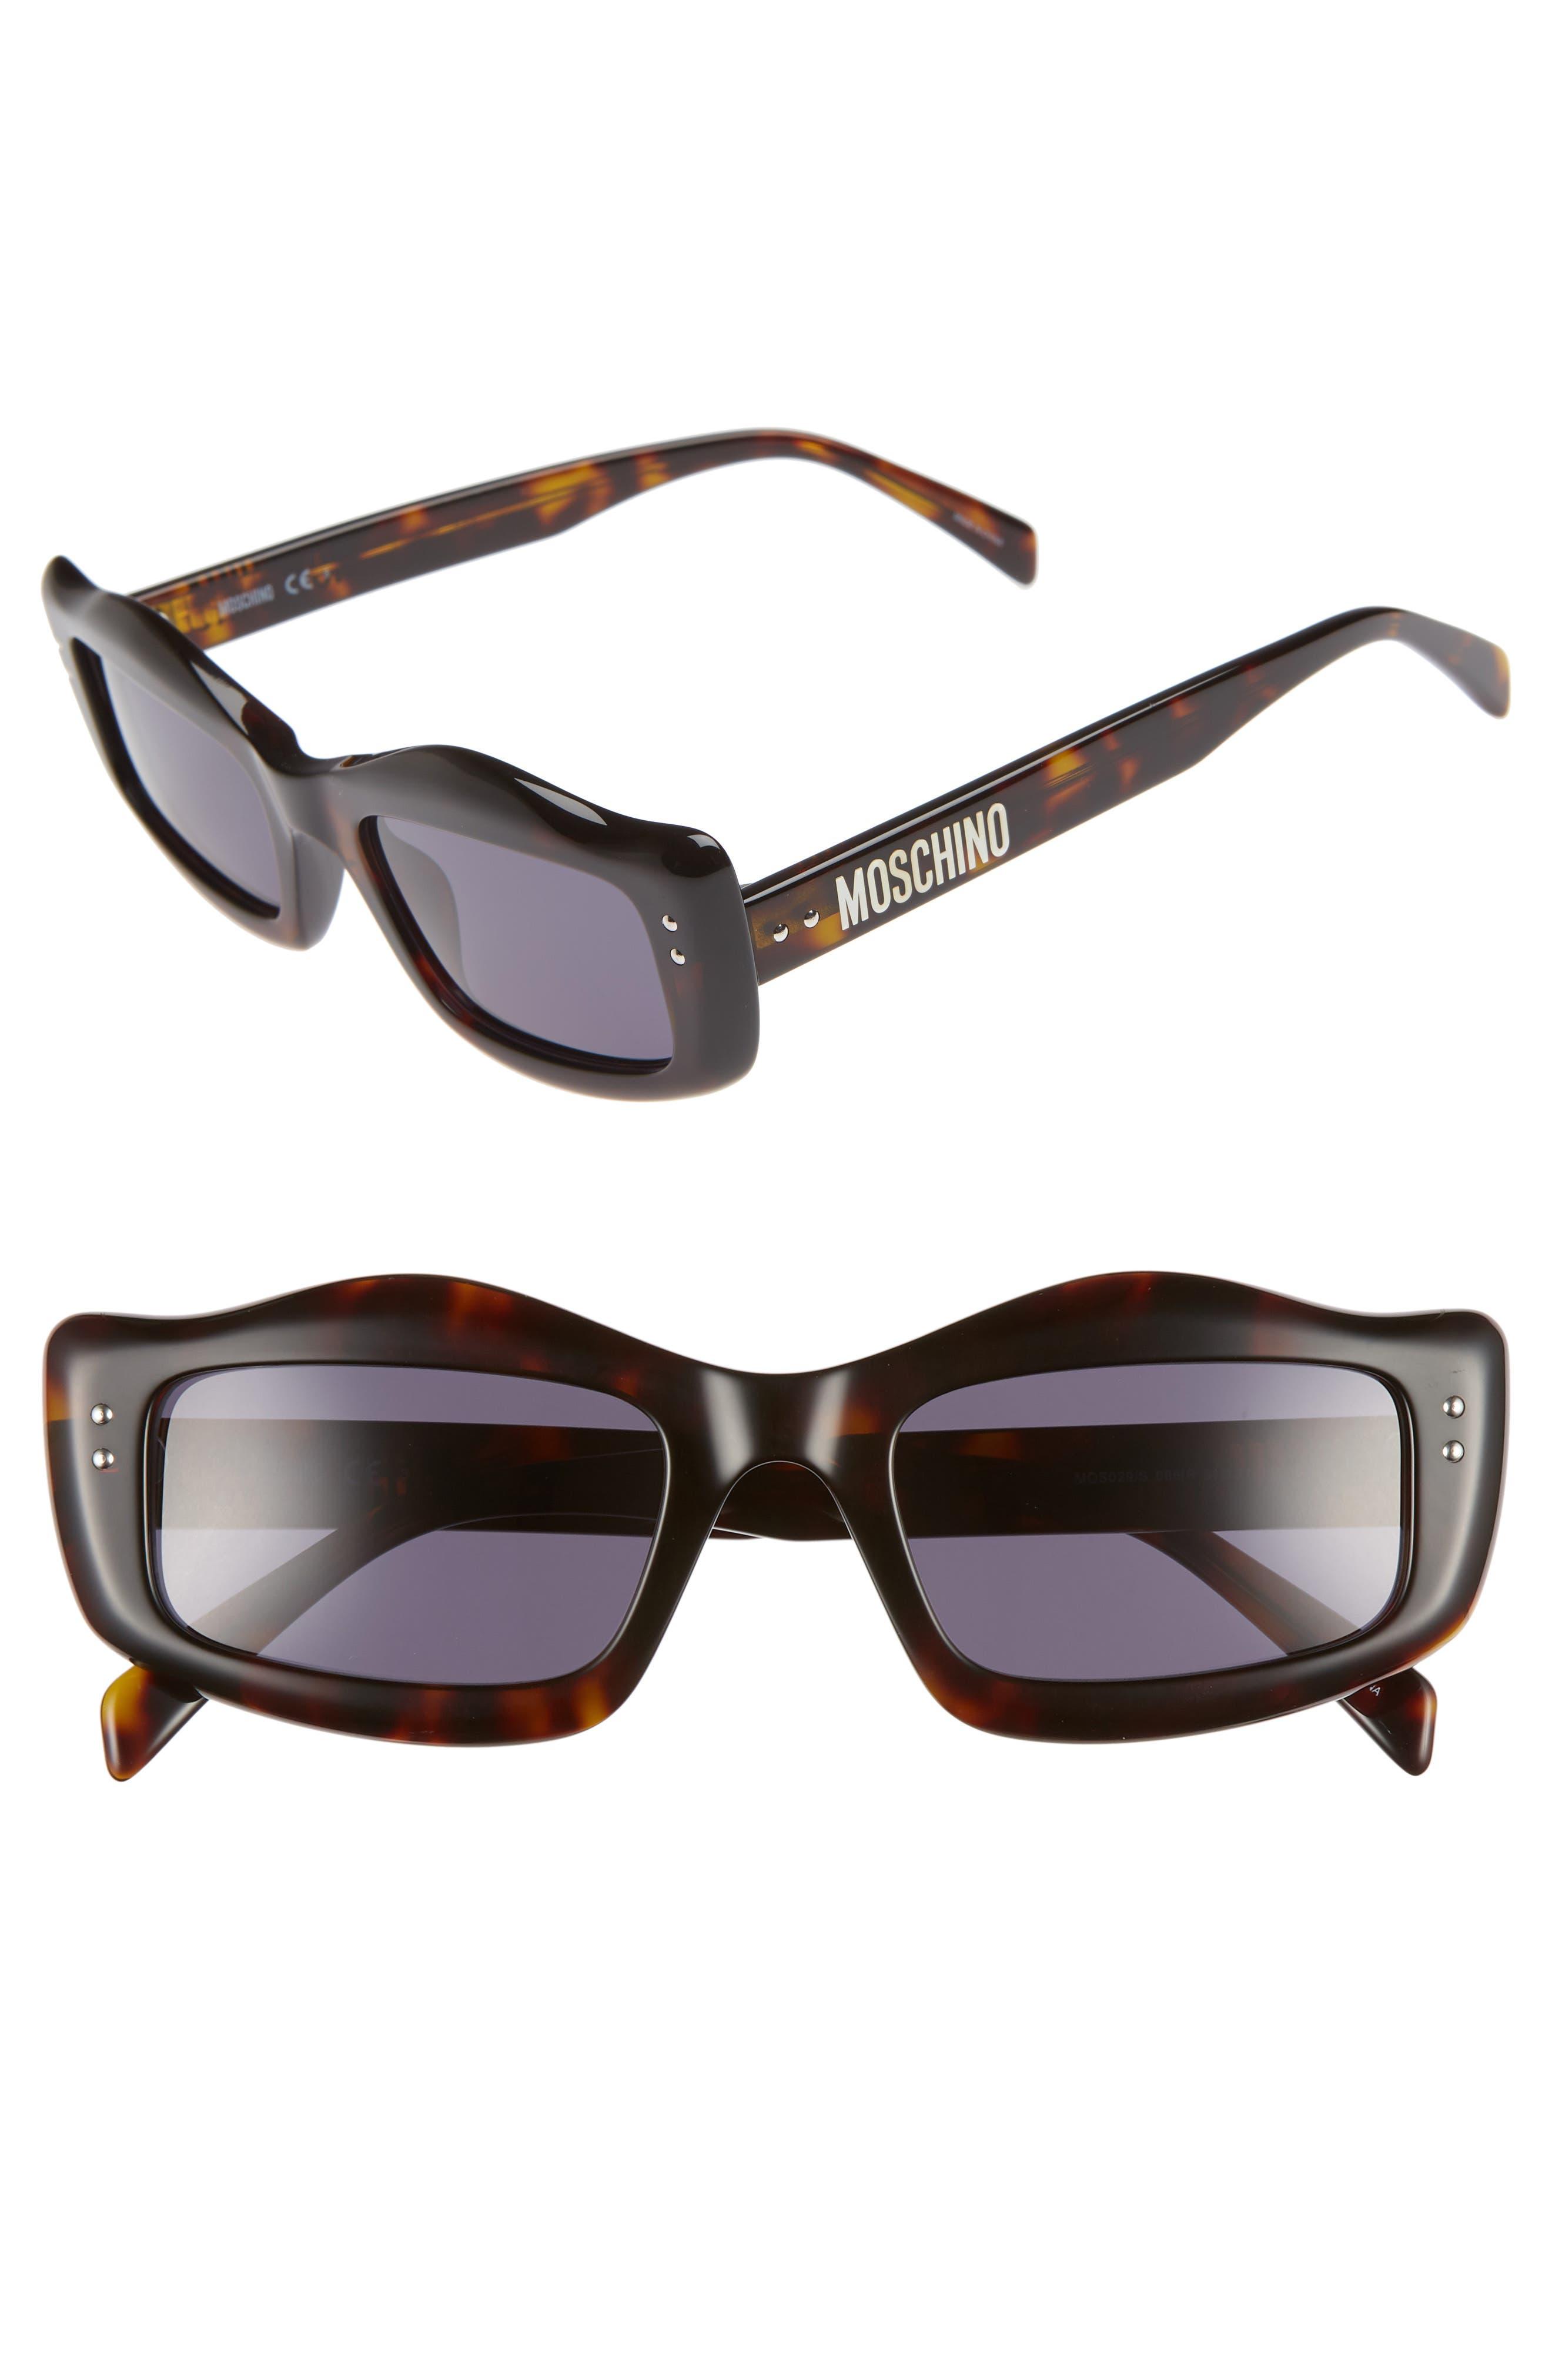 MOSCHINO, 51mm Rectangle Sunglasses, Main thumbnail 1, color, DARK HAVANA